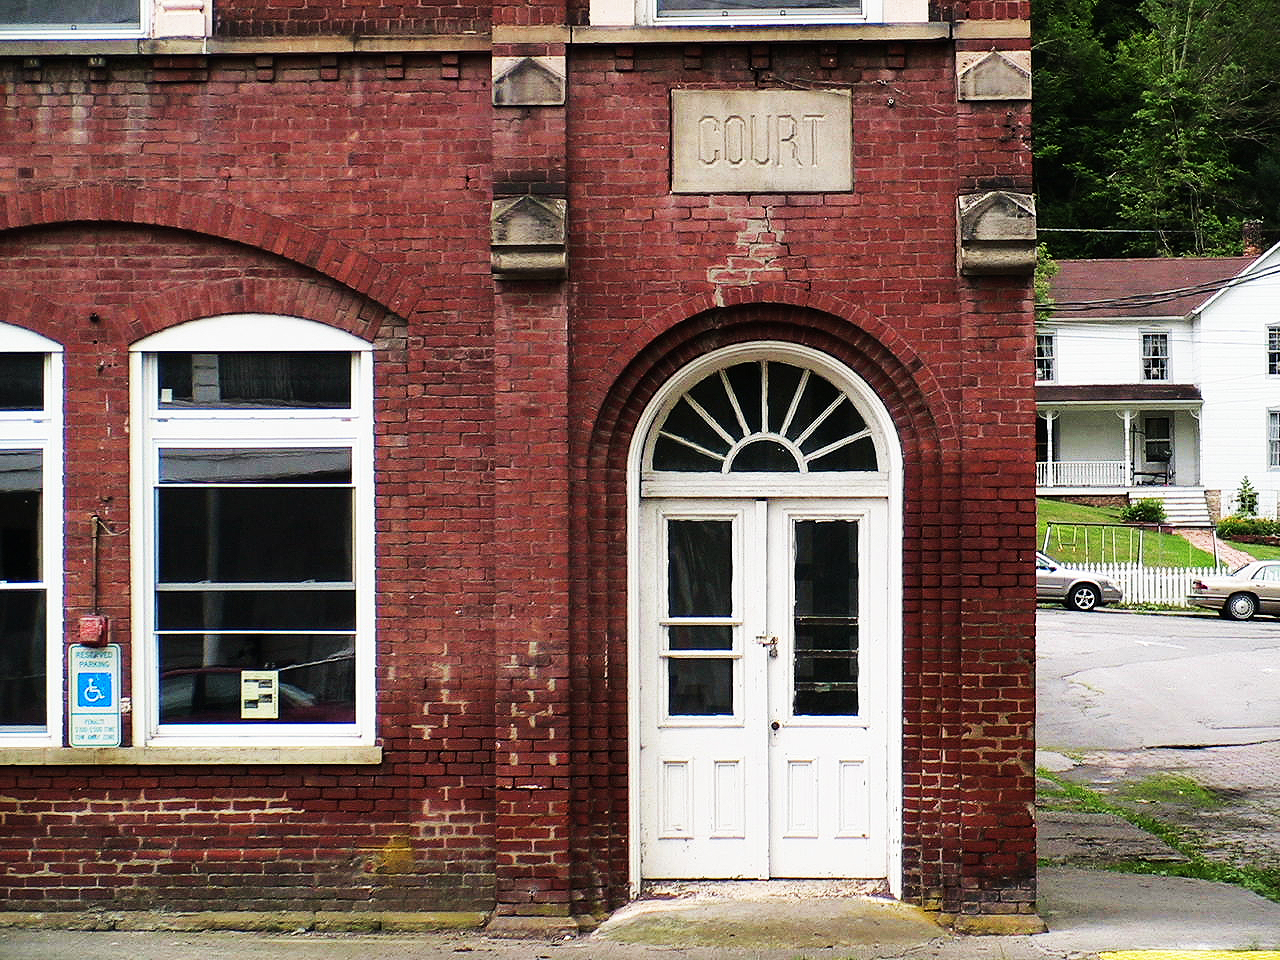 Tony_Ward_Studio_old_court_house_Radford_Virginia